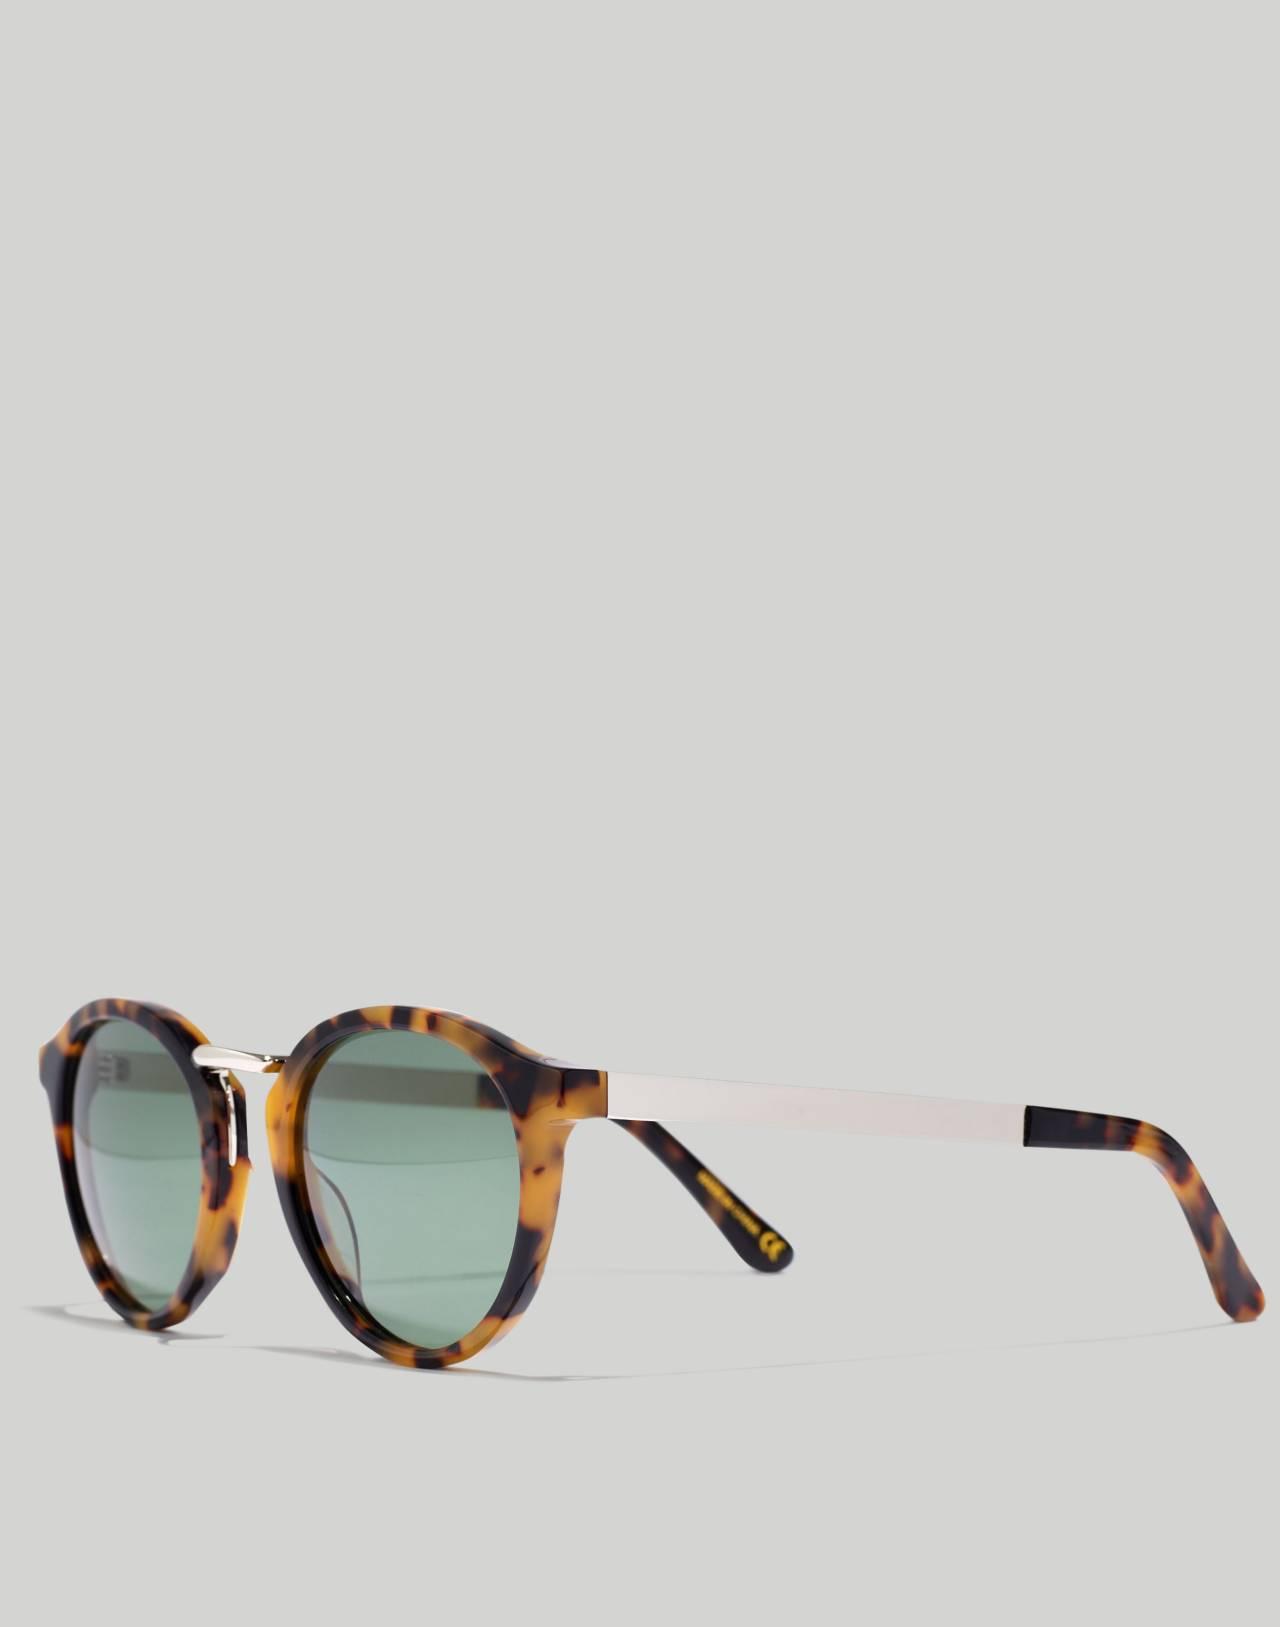 Indio Sunglasses in demi tort image 2